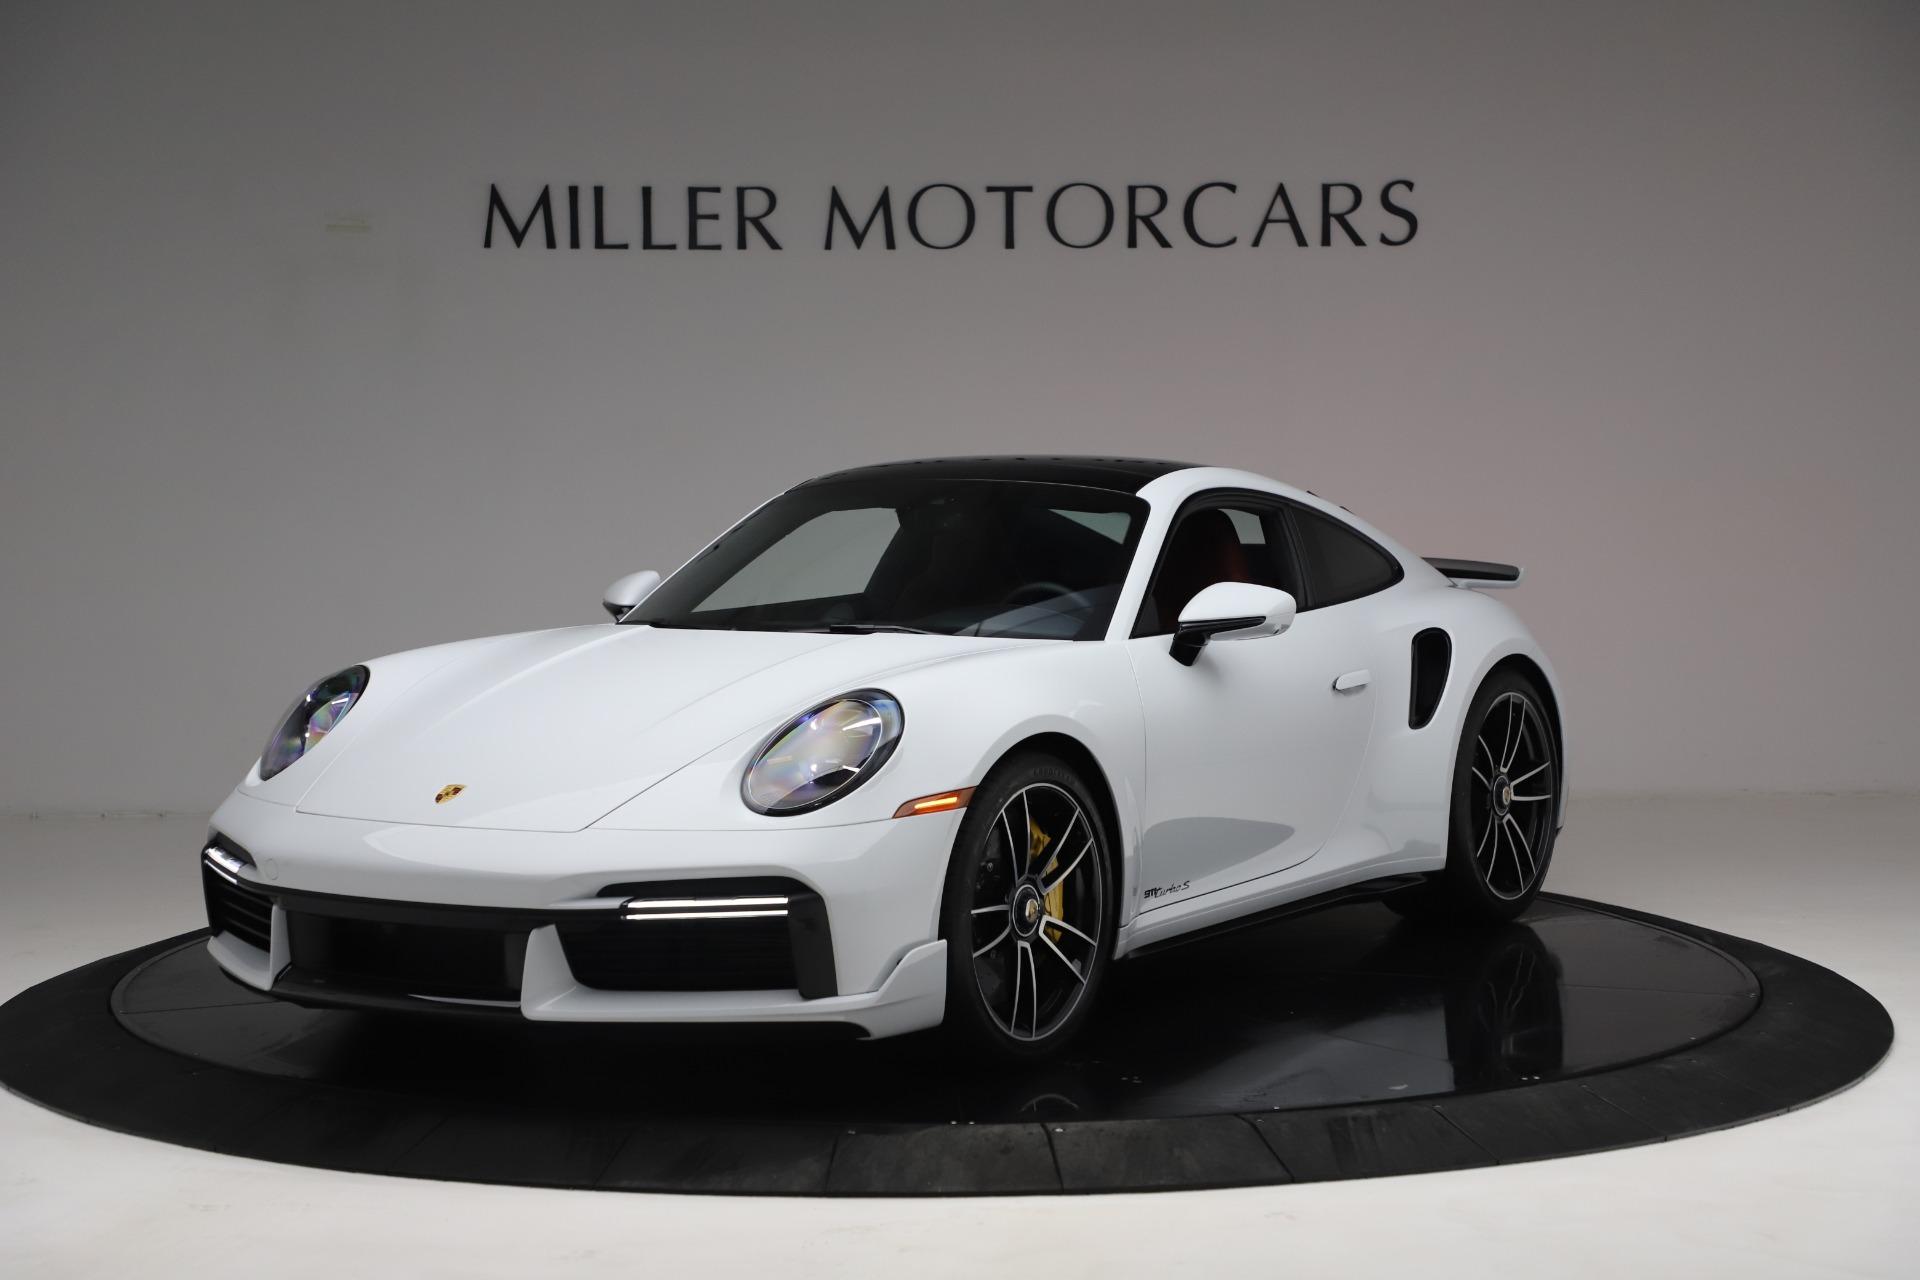 Used 2021 Porsche 911 Turbo S for sale Sold at Bugatti of Greenwich in Greenwich CT 06830 1